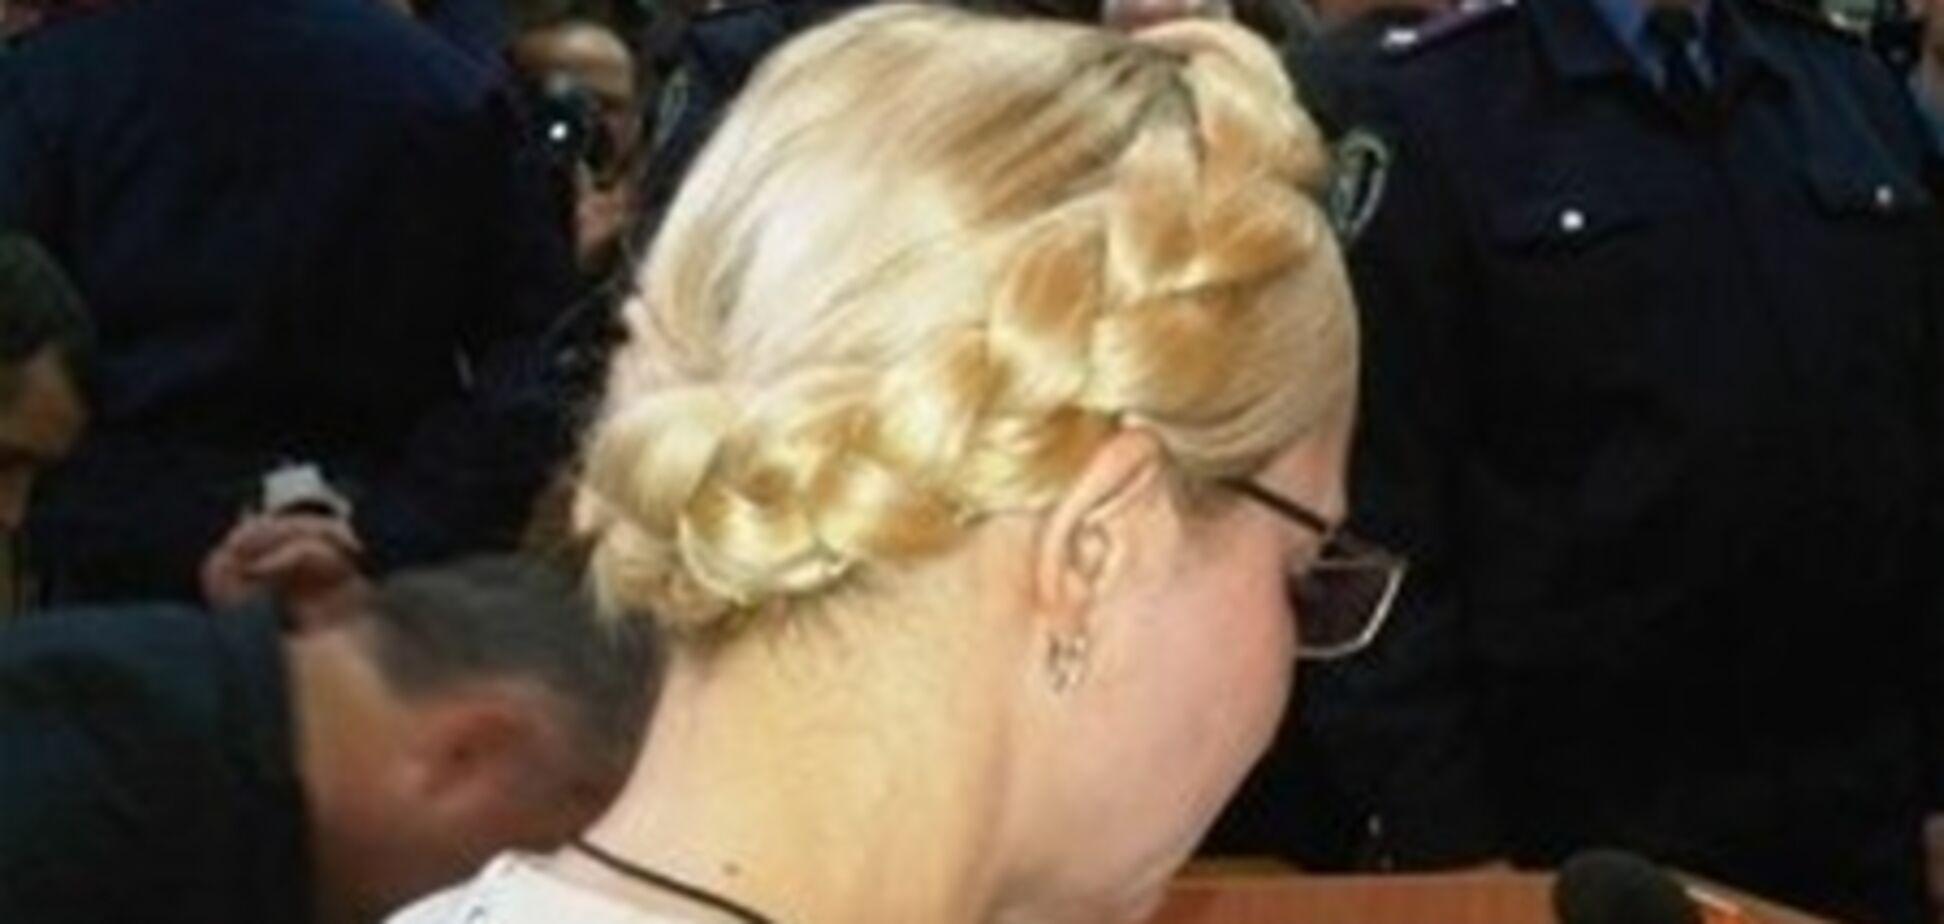 Суд в СИЗО: Тимошенко не поднялась с кровати